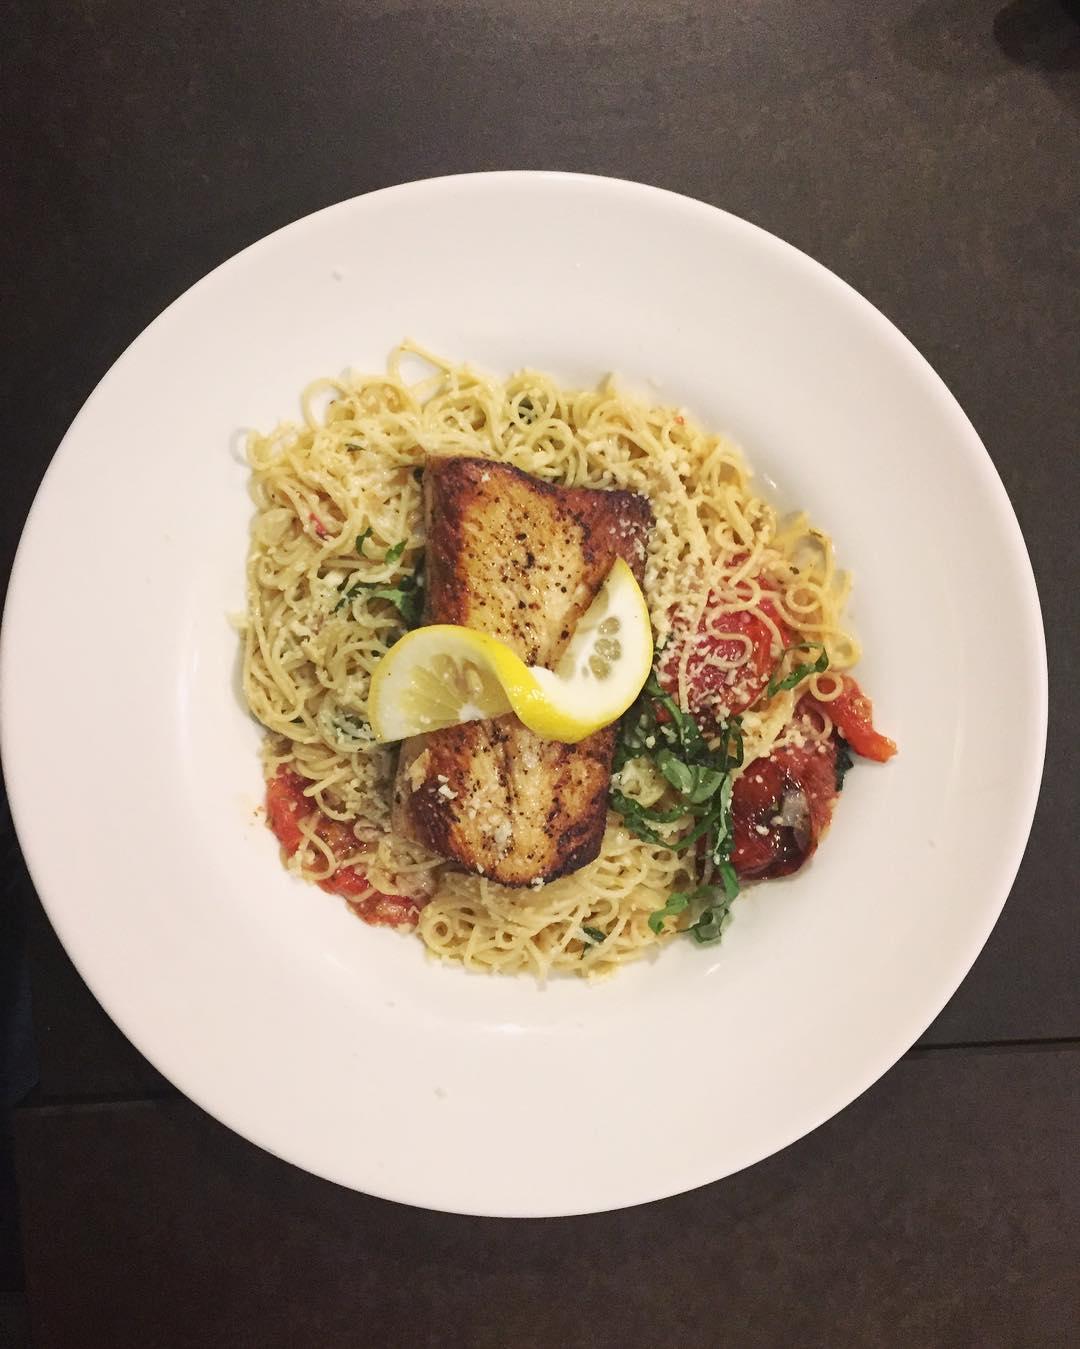 Va Bene Instagram Photo: @duluthloveslocal Mahi mahi pasta @vabenecaffe  #duluth #eatlocal #vabeneduluth #italian #pasta #mahimahi #capturemn #exploremn #onlyinmn #shoplocal #duluthloveslocal